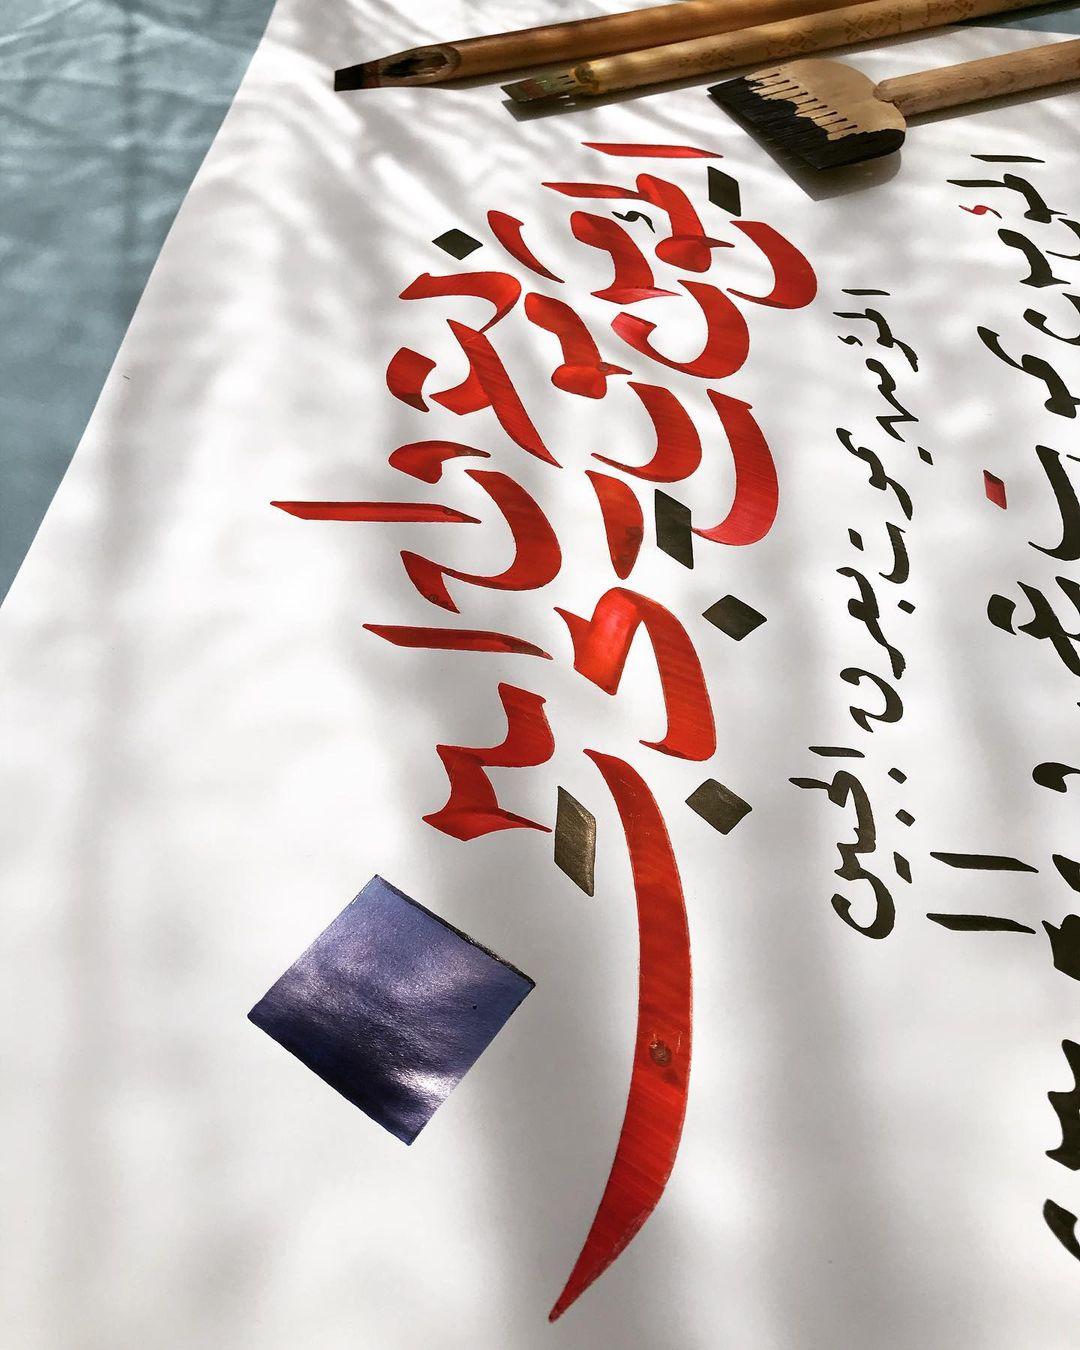 Donwload Photo المؤمن يموت بعرق الجبين #typografi #lettering #hüsnihat #kaligrafi #فن #فنون #خ...- hattat_aa 5